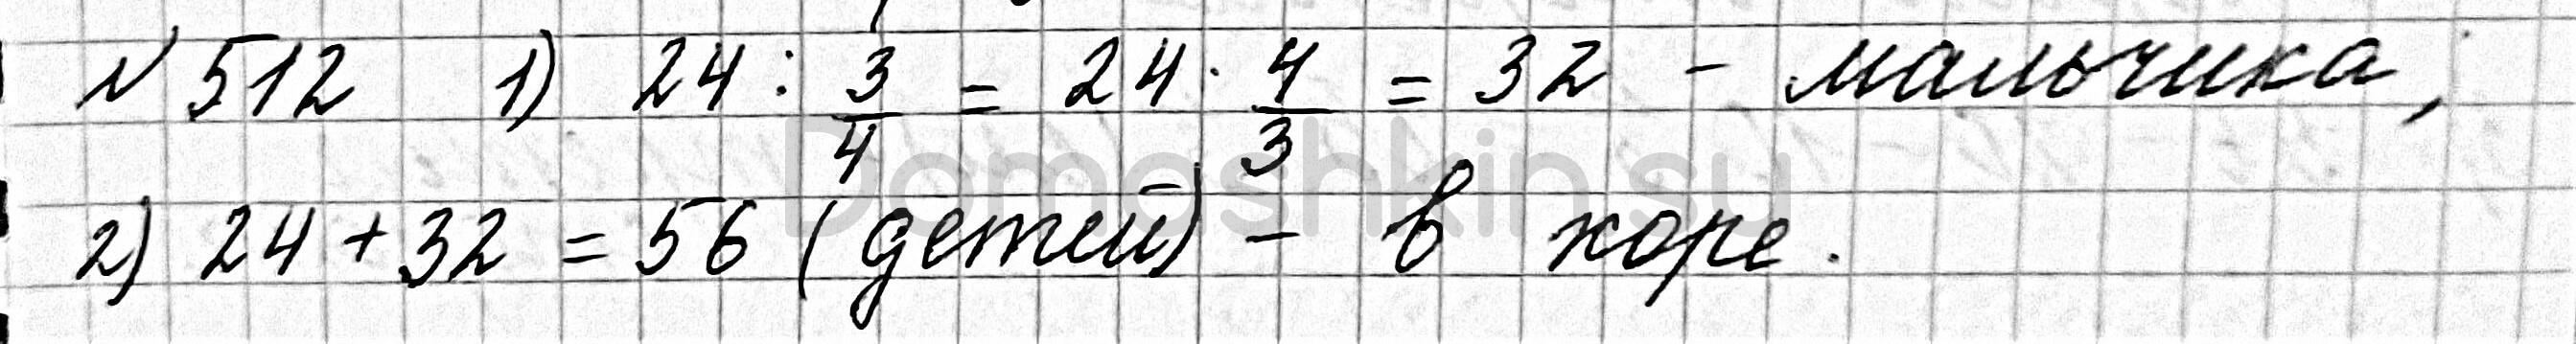 Математика 6 класс учебник Мерзляк номер 512 решение